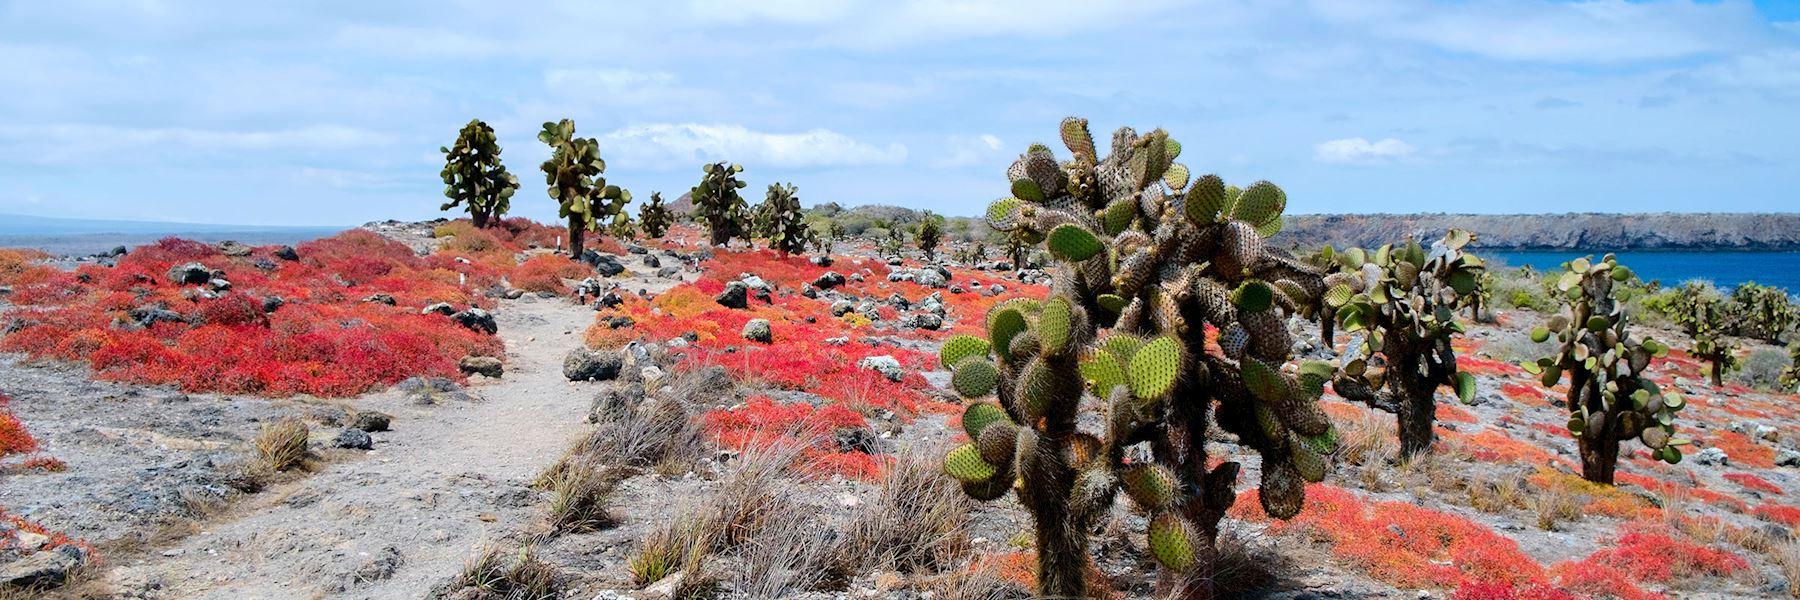 Galapagos Islands trip ideas